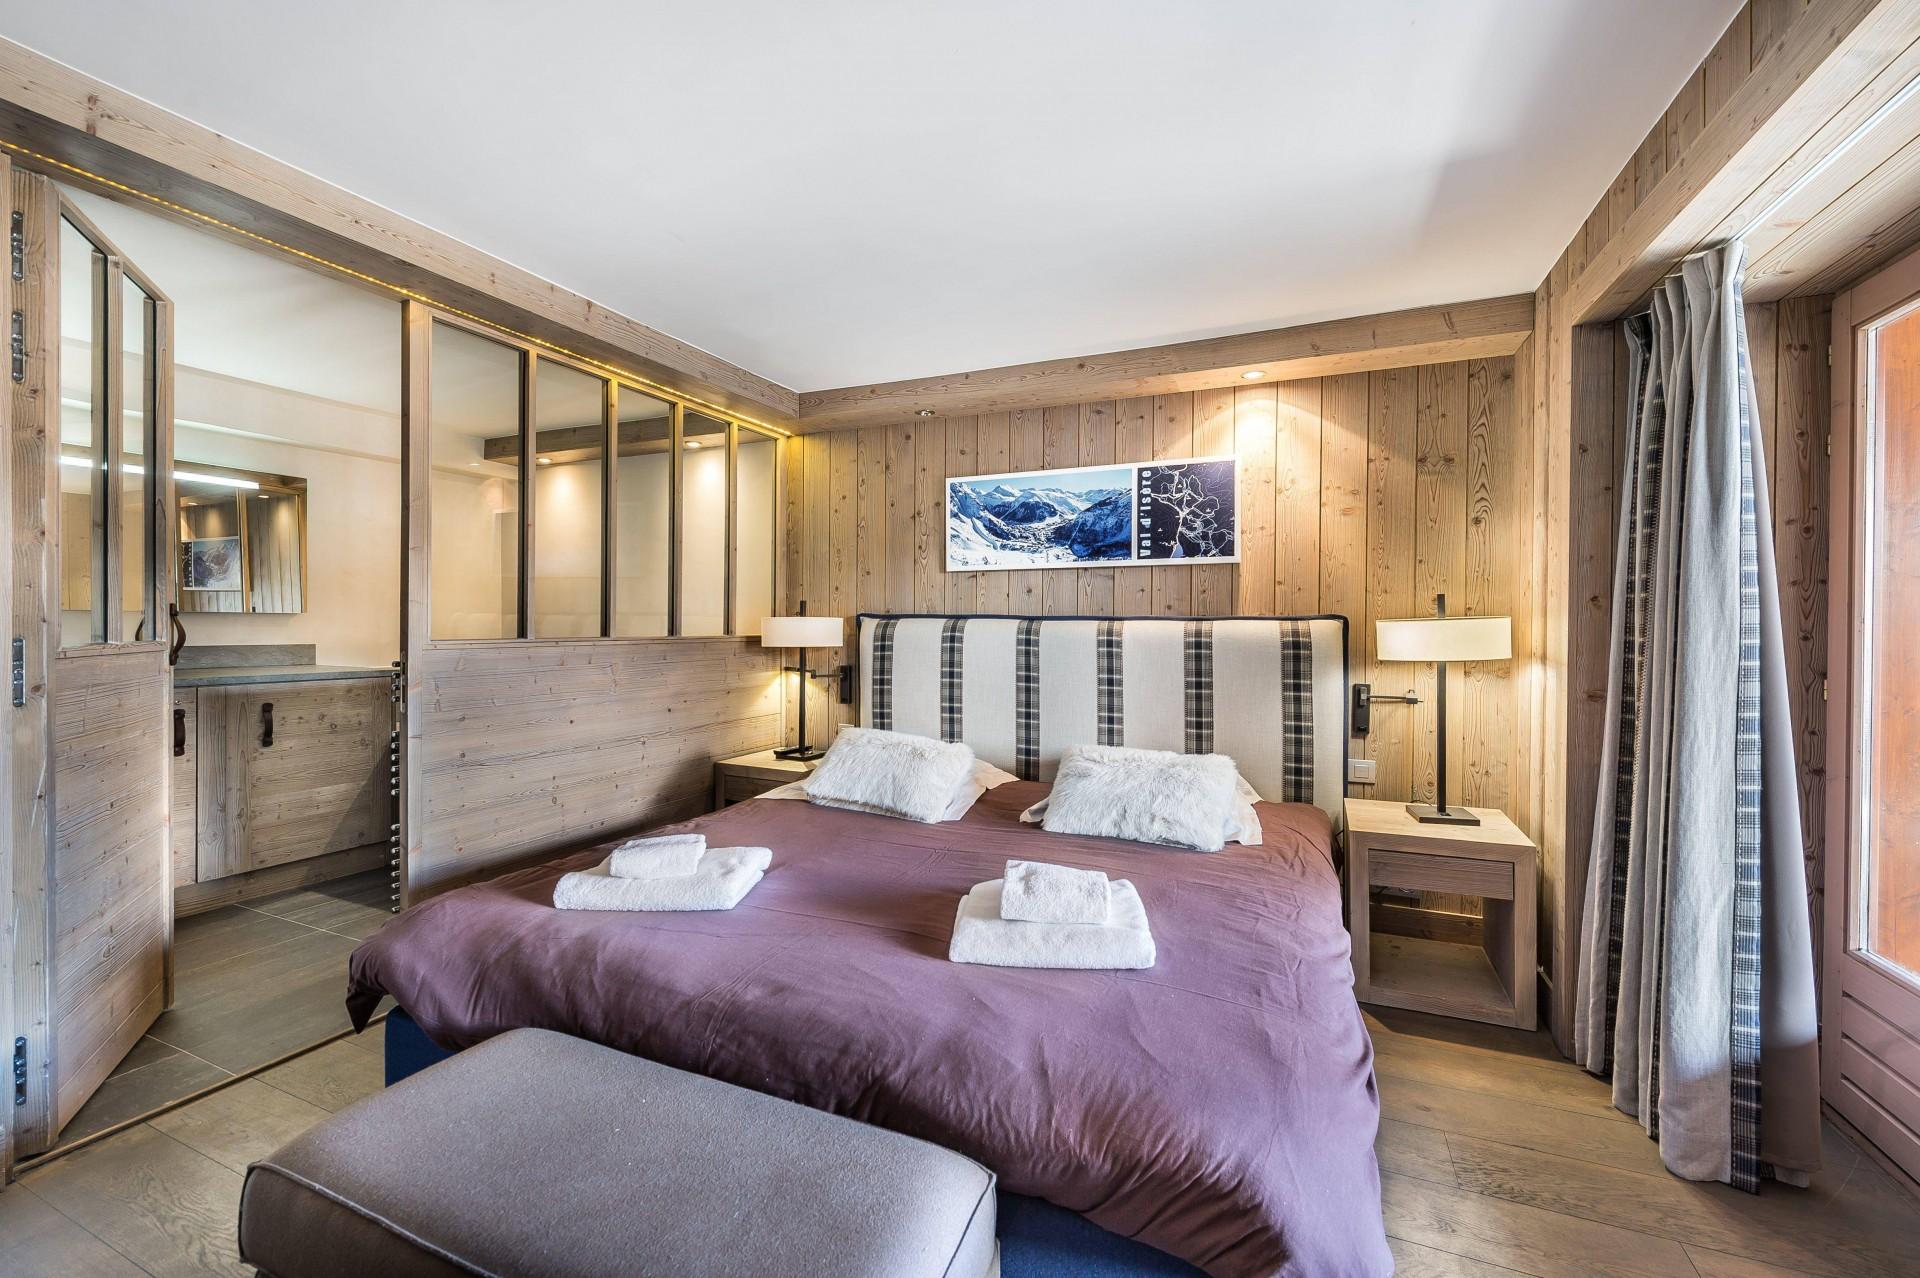 Val d'Isère Luxury Rental Appartment Viteli Bedroom 2